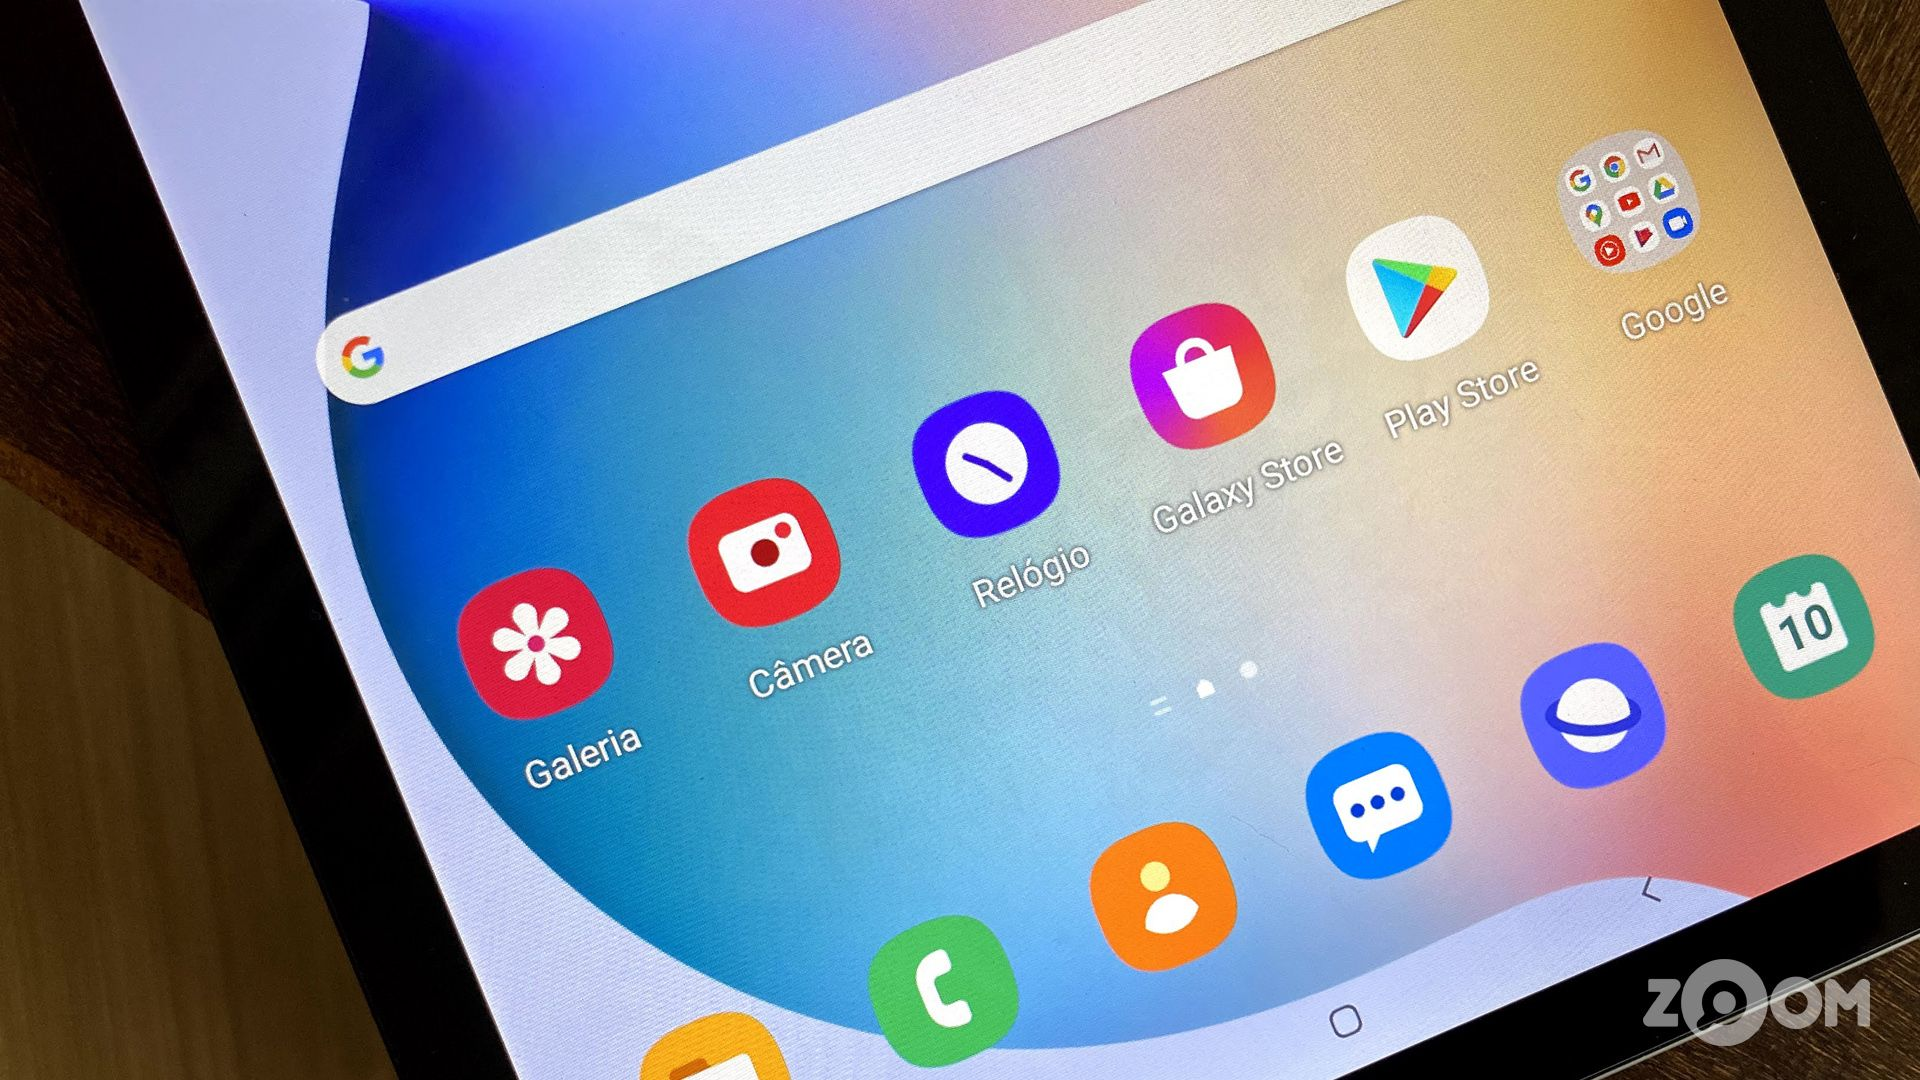 Apps na tela do Galaxy Tab S6 Lite. (Imagem: Ana Marques/Zoom)